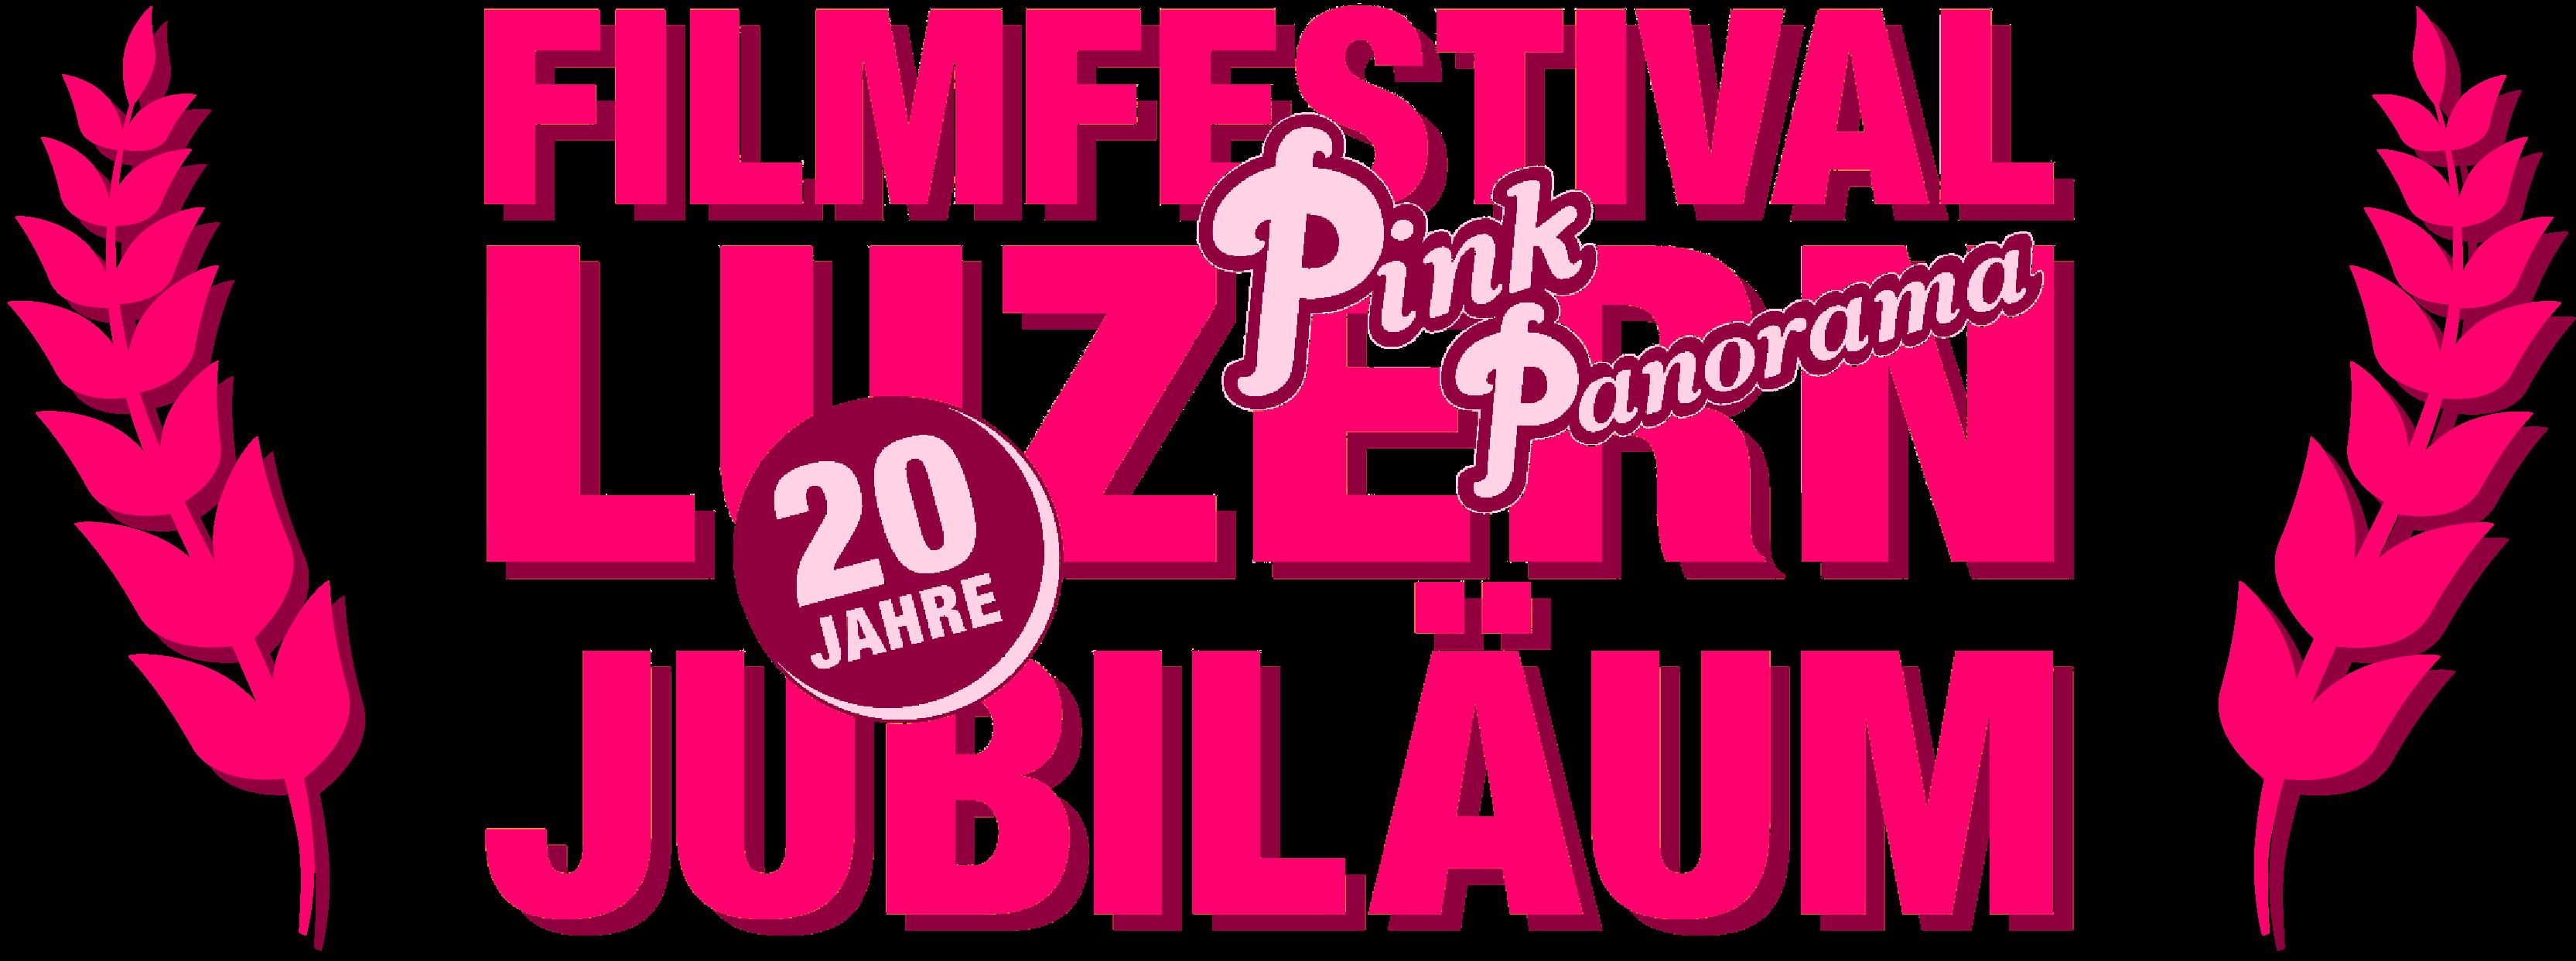 PinkPanorama - Filmfestival Luzern